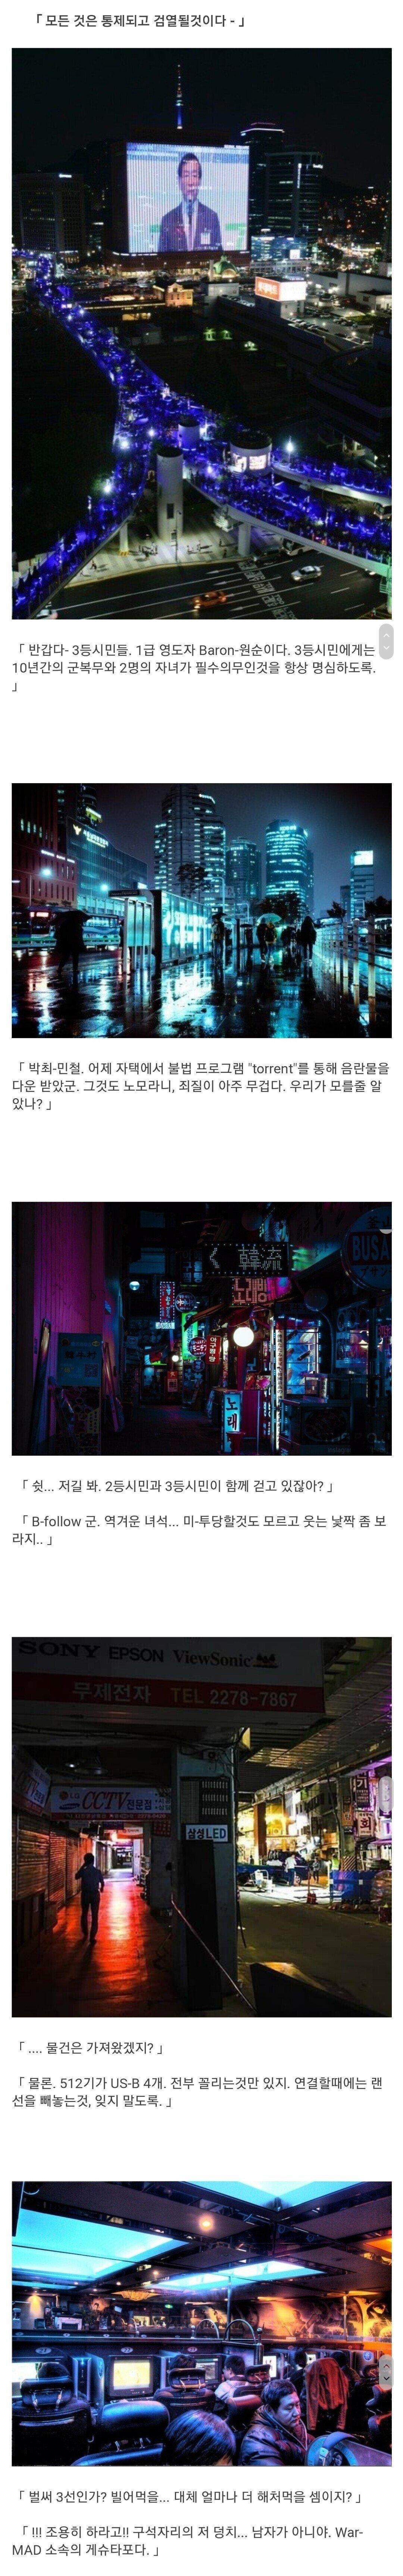 Screenshot_20190530-130238_Samsung Internet.jpg 싸이버펑크 코리아